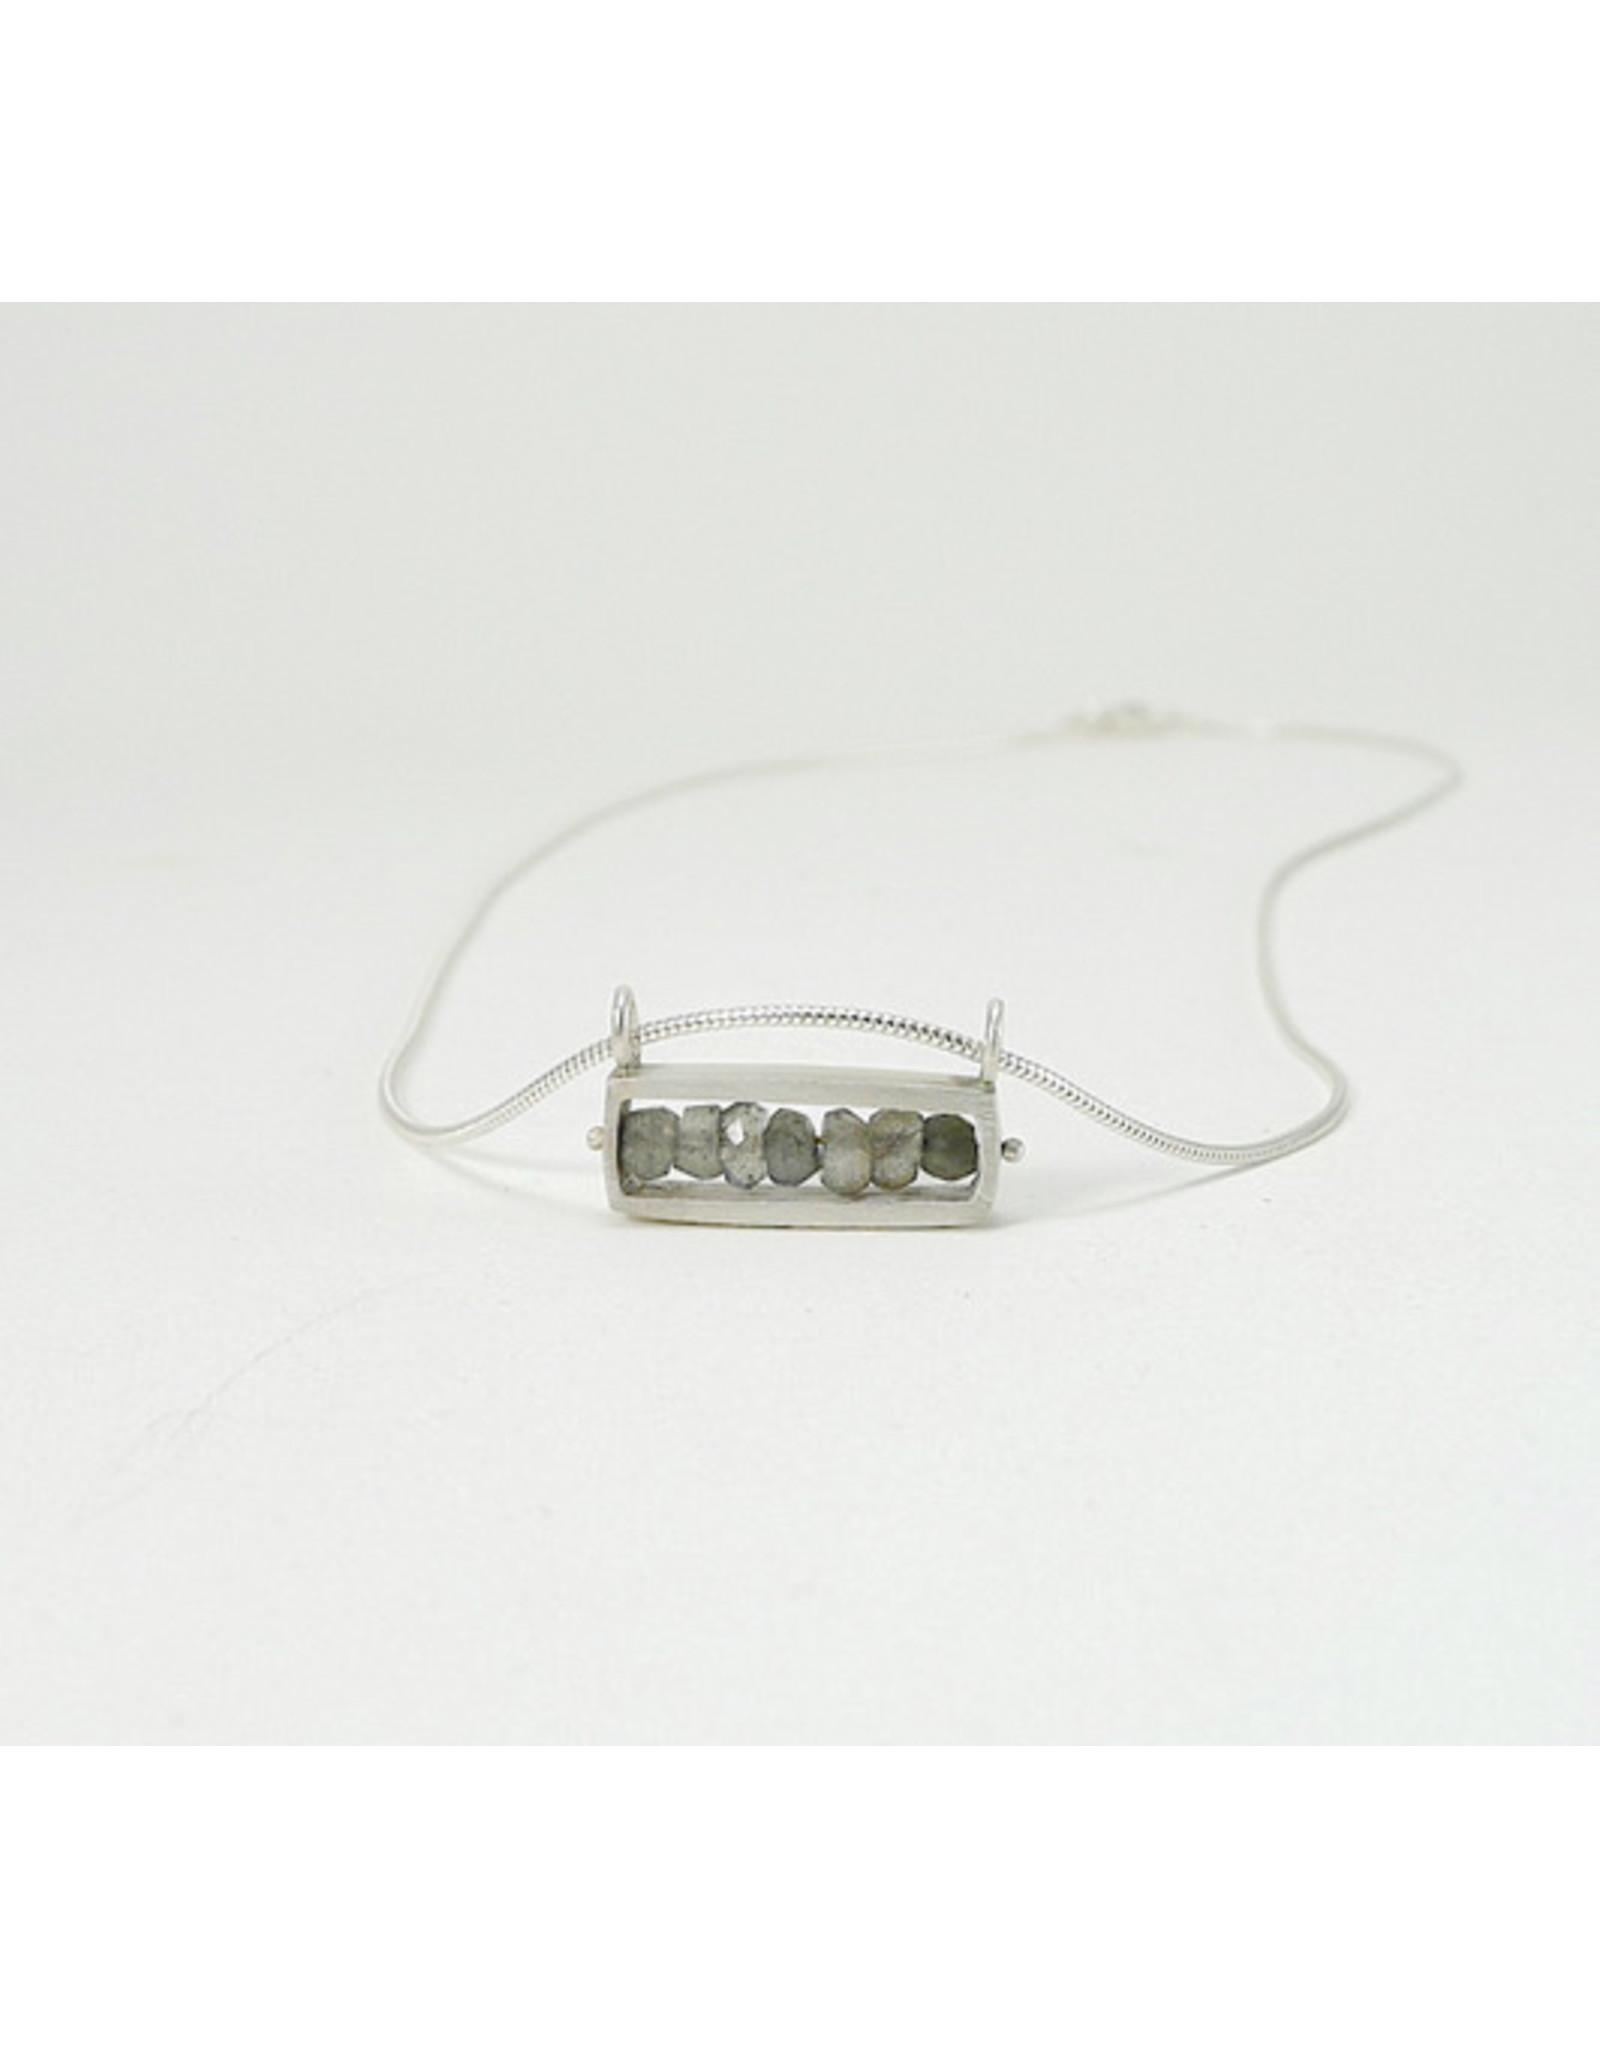 Bridget Clark - Consignment N0172 Sterling Rectangle - Labradorite